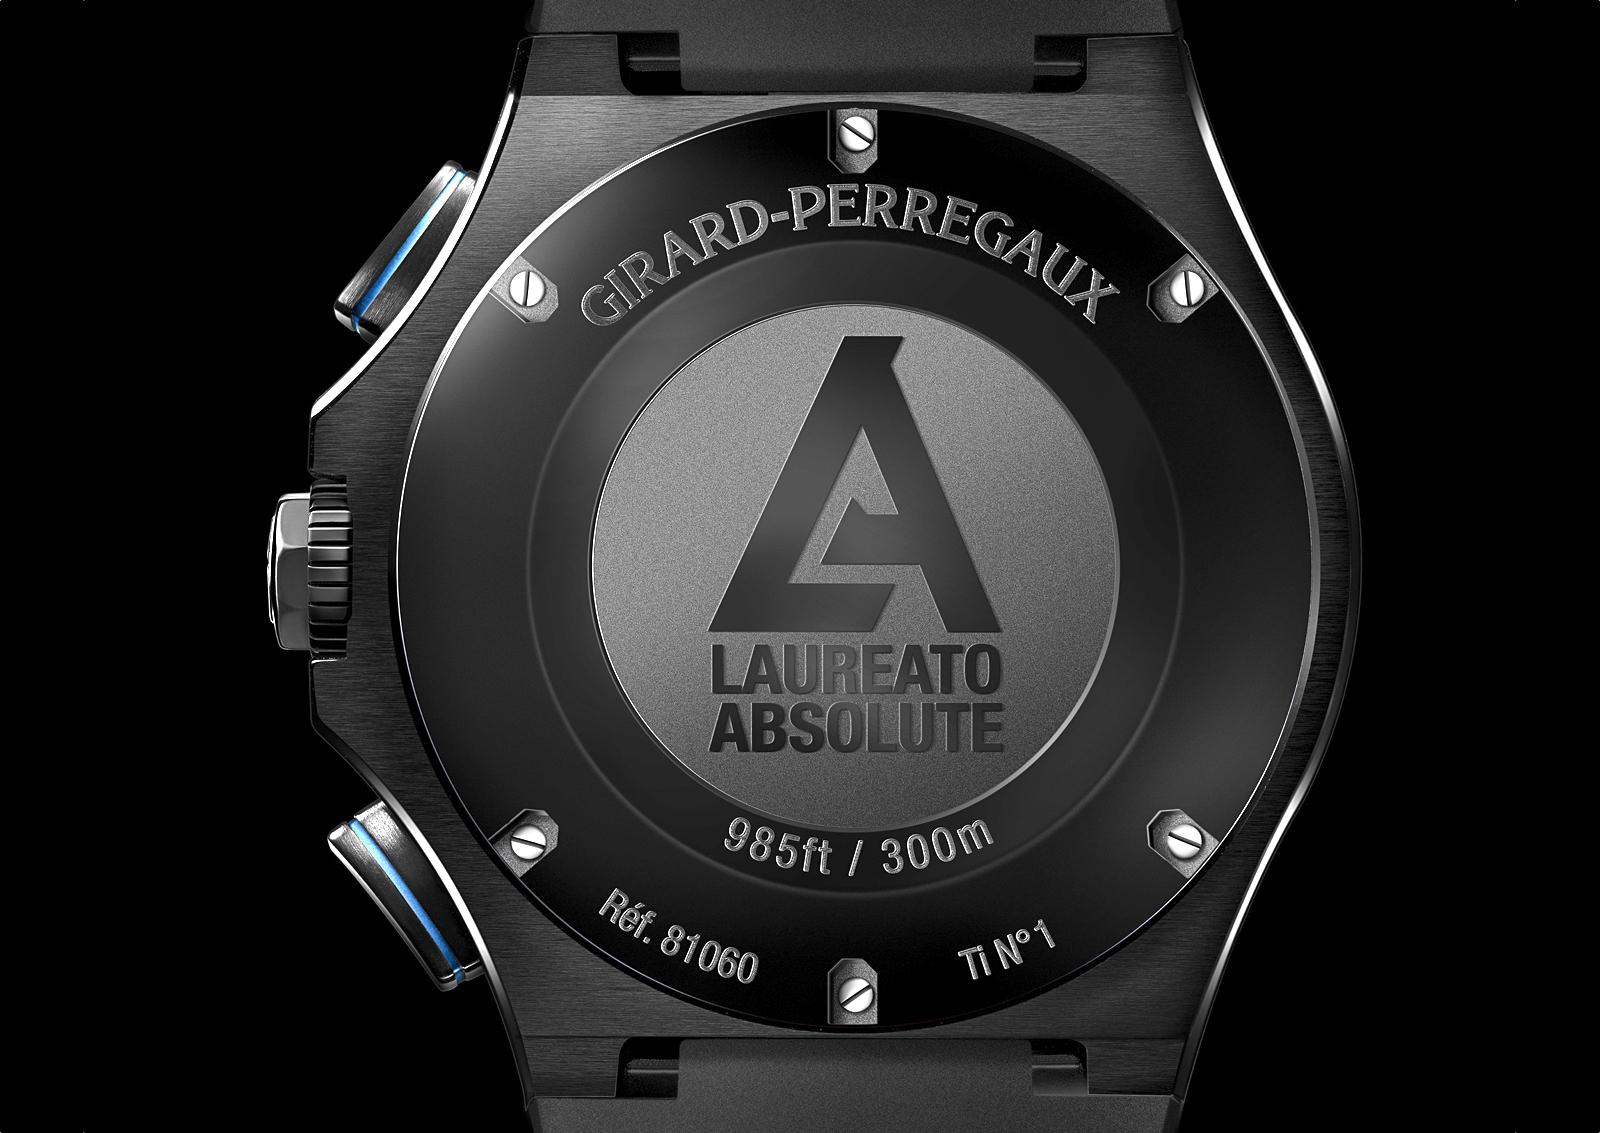 Girard-Perregaux Laureato Absolute Chronograph Caseback